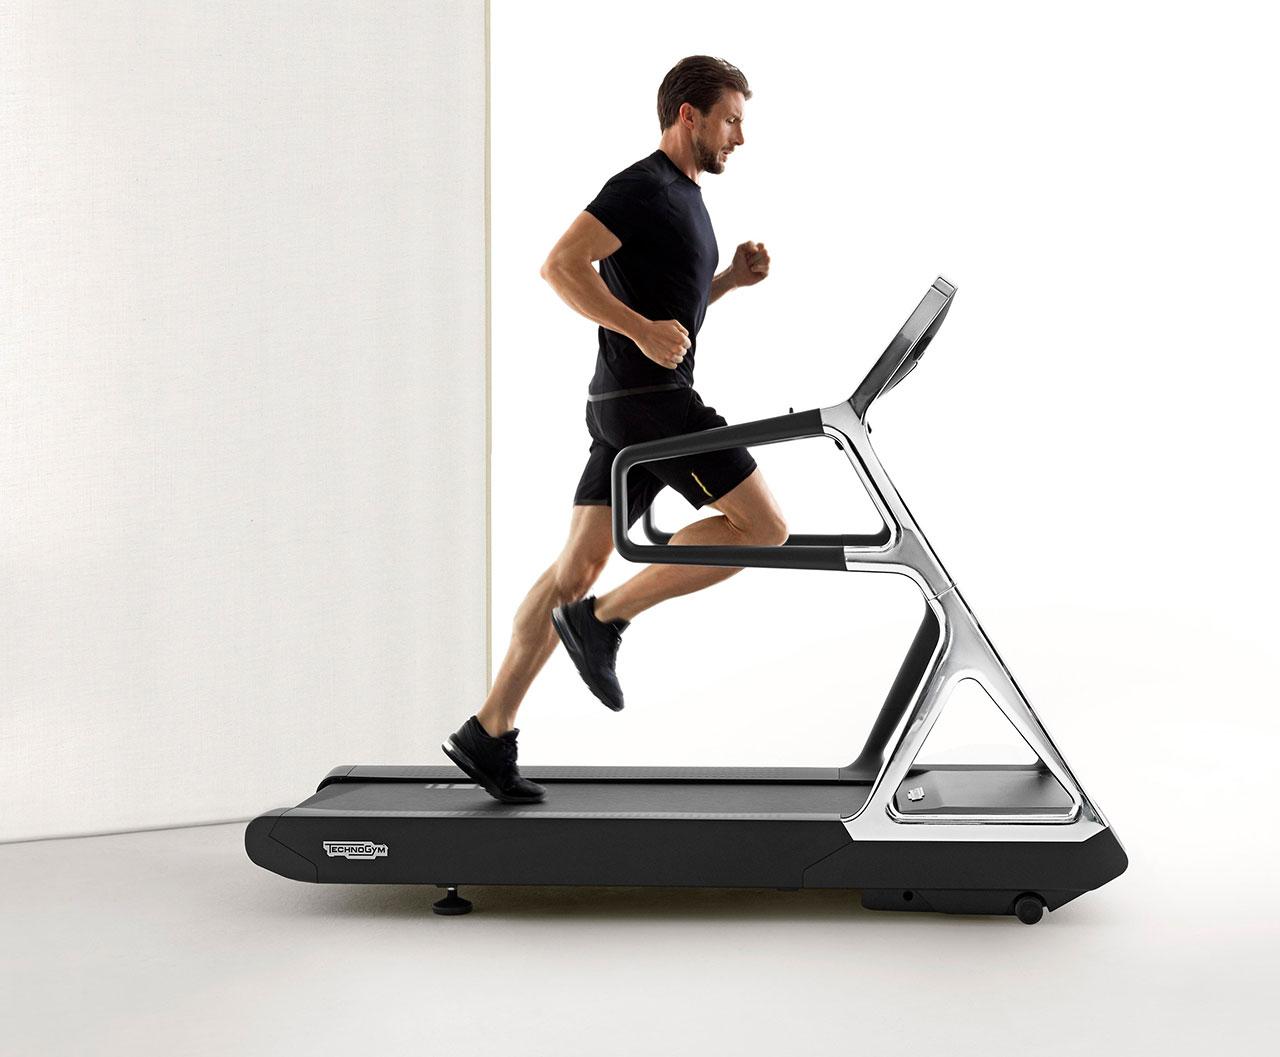 RUN PERSONAL treadmill designed by Antonio Citterio forTechnogym,©Technogym.